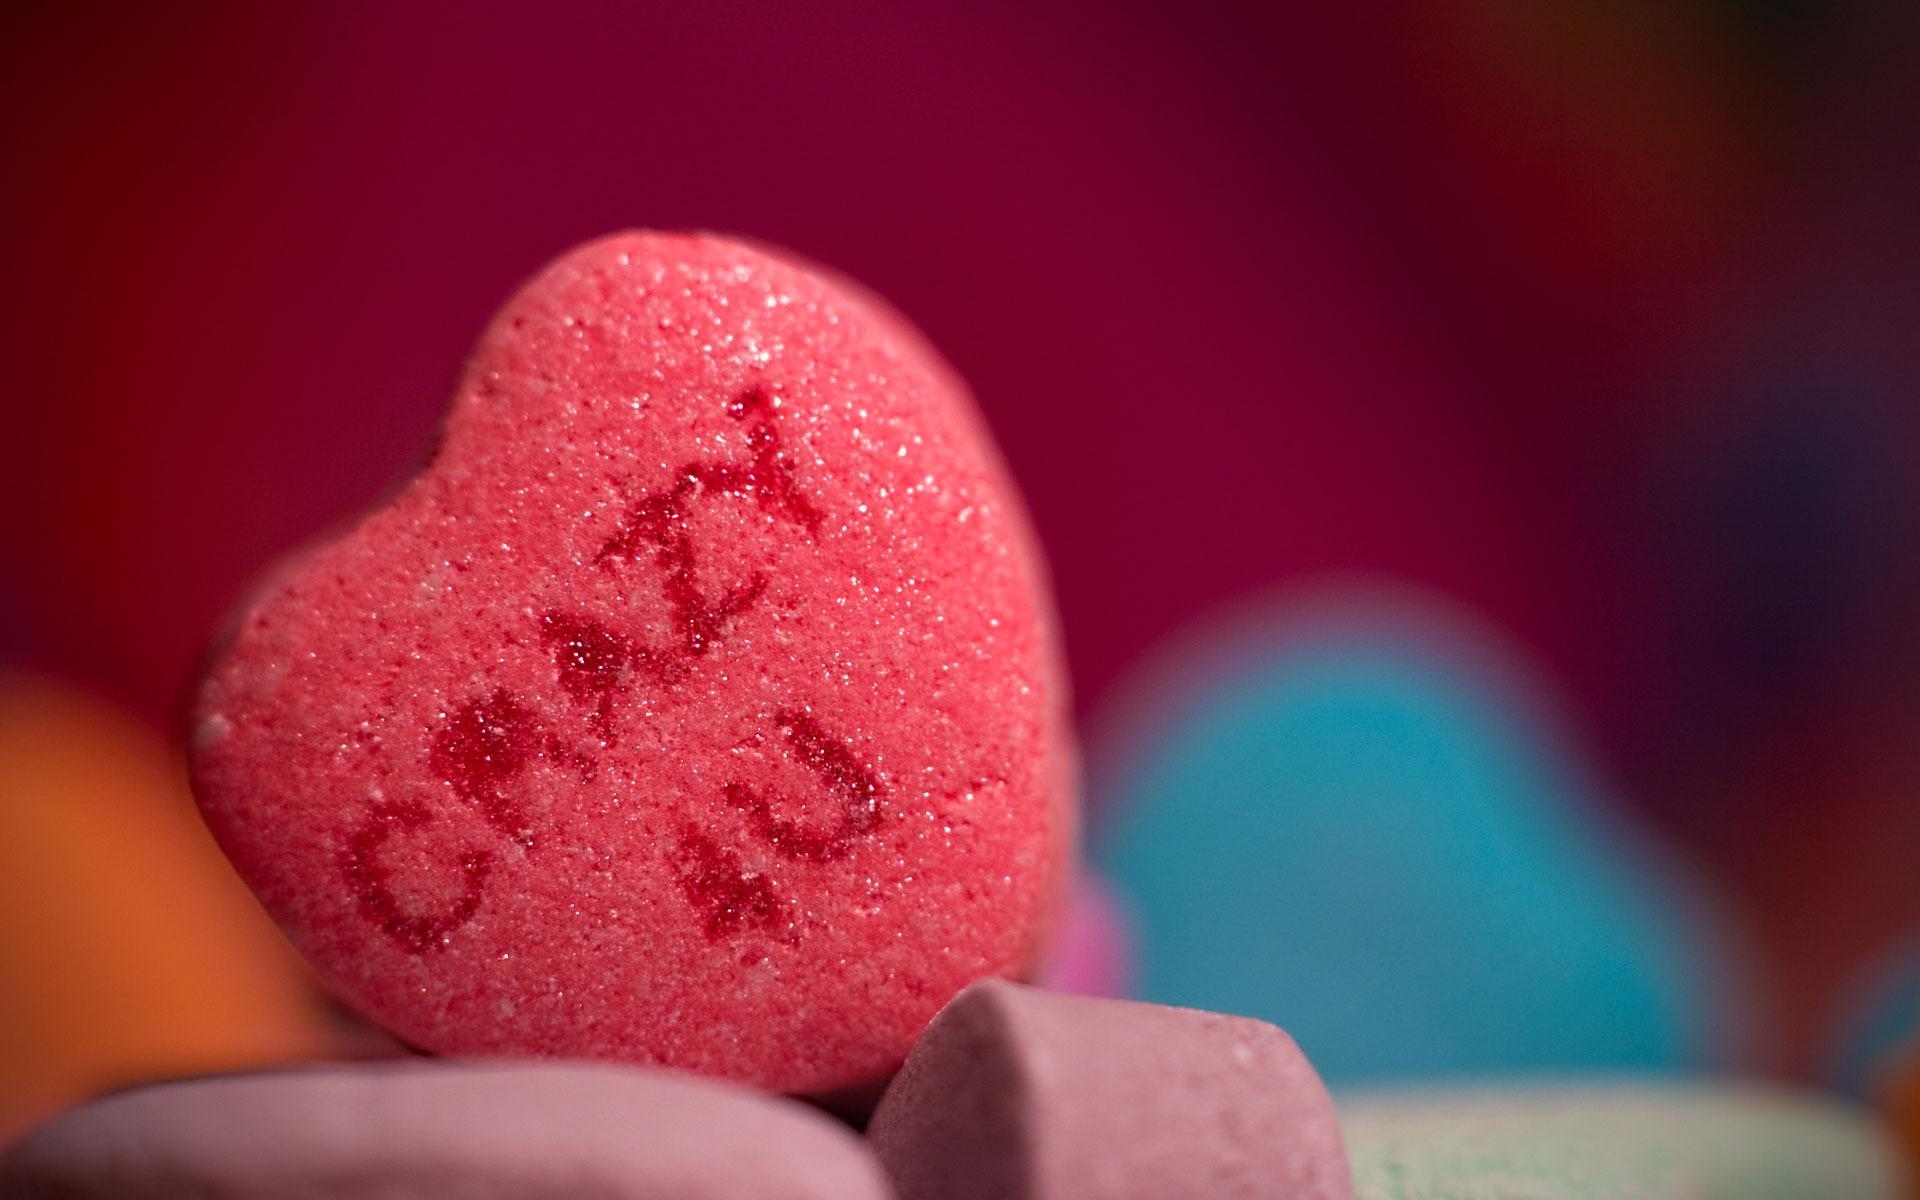 Hintergrundbilder : Lebensmittel, Herz, rot, Rosa, Dessert, Farbe ...